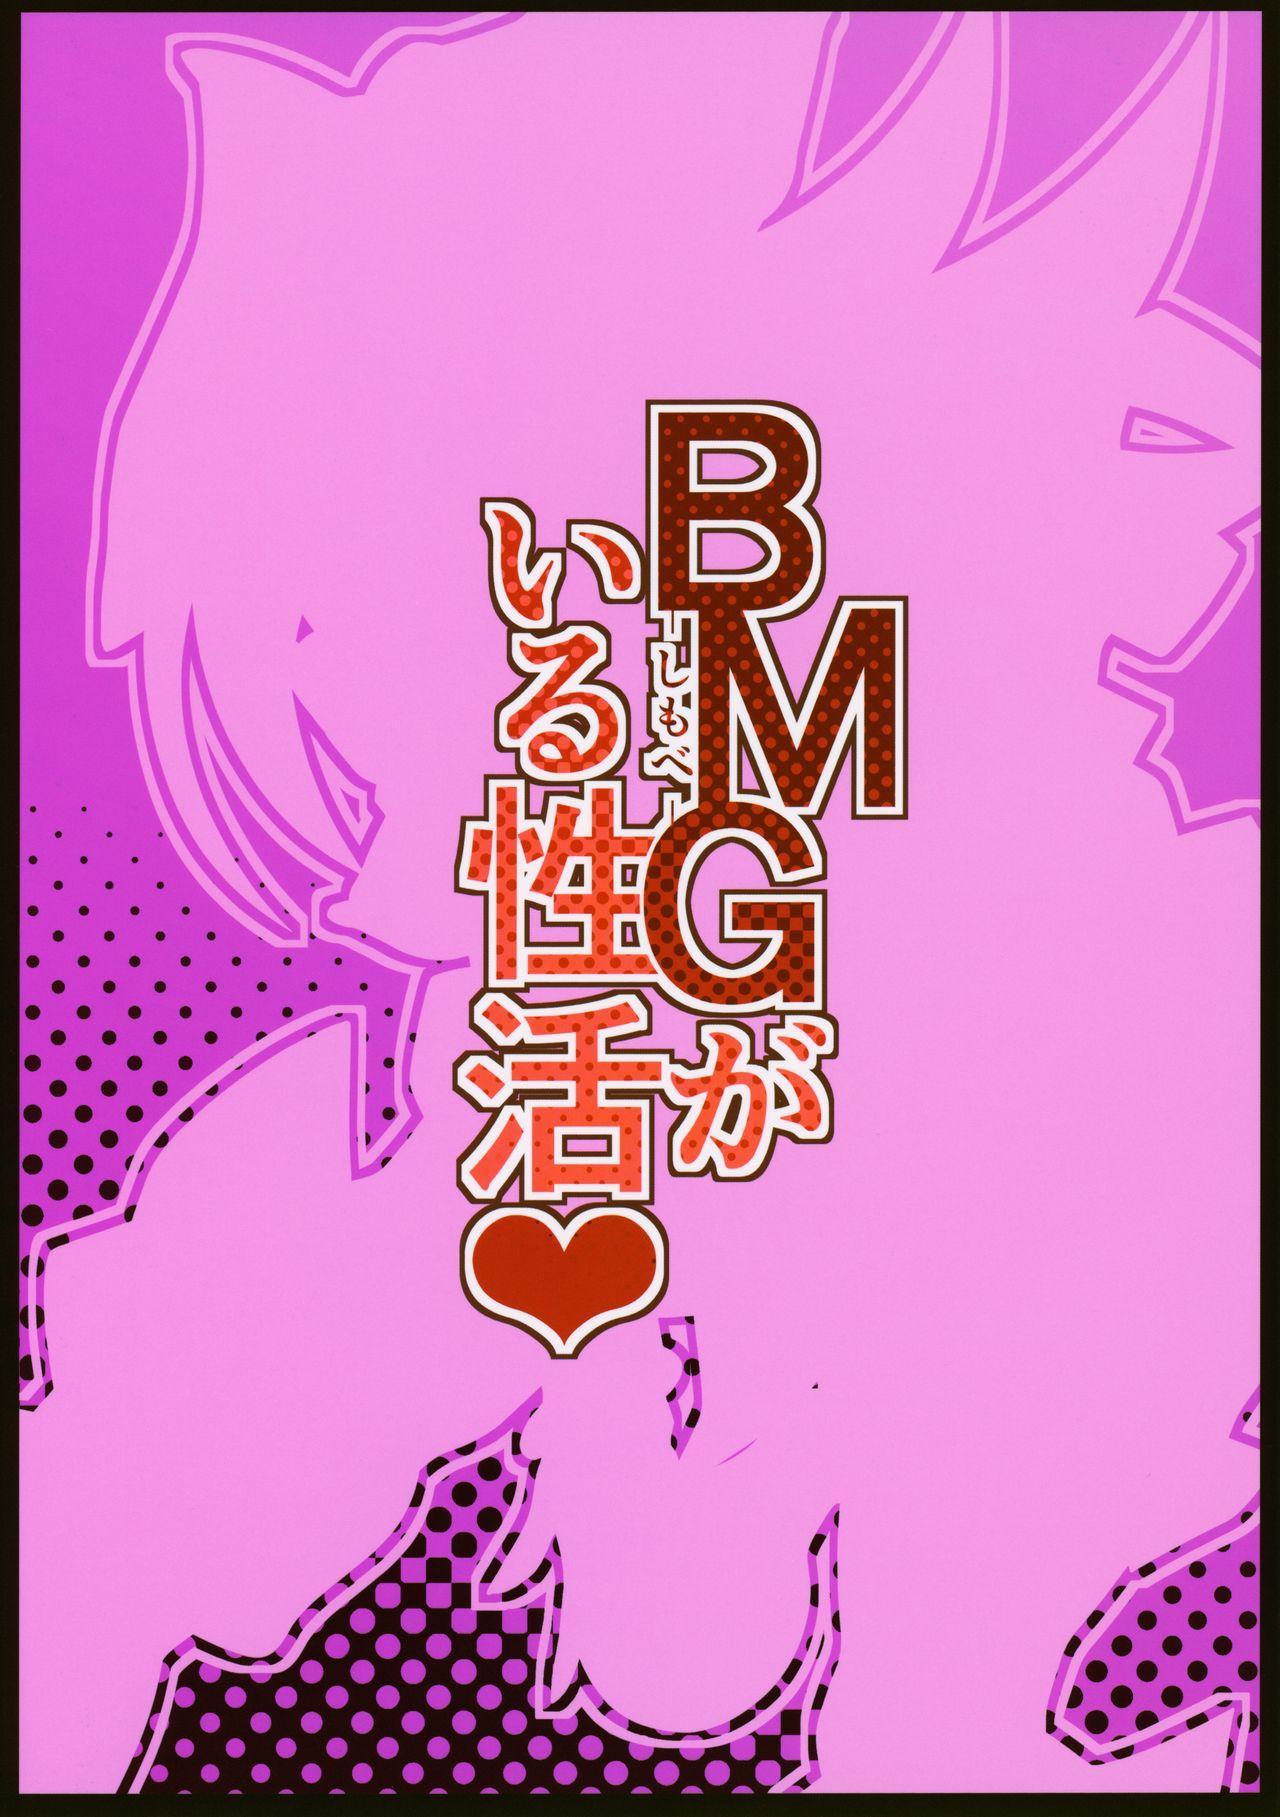 [4or5 Works (Chicago)] BMG -Shimobe- ga Iru Seikatsu | Sex Life with -Servant- BMG (Yu-Gi-Oh!) [English] [AdmiralMoe] 25